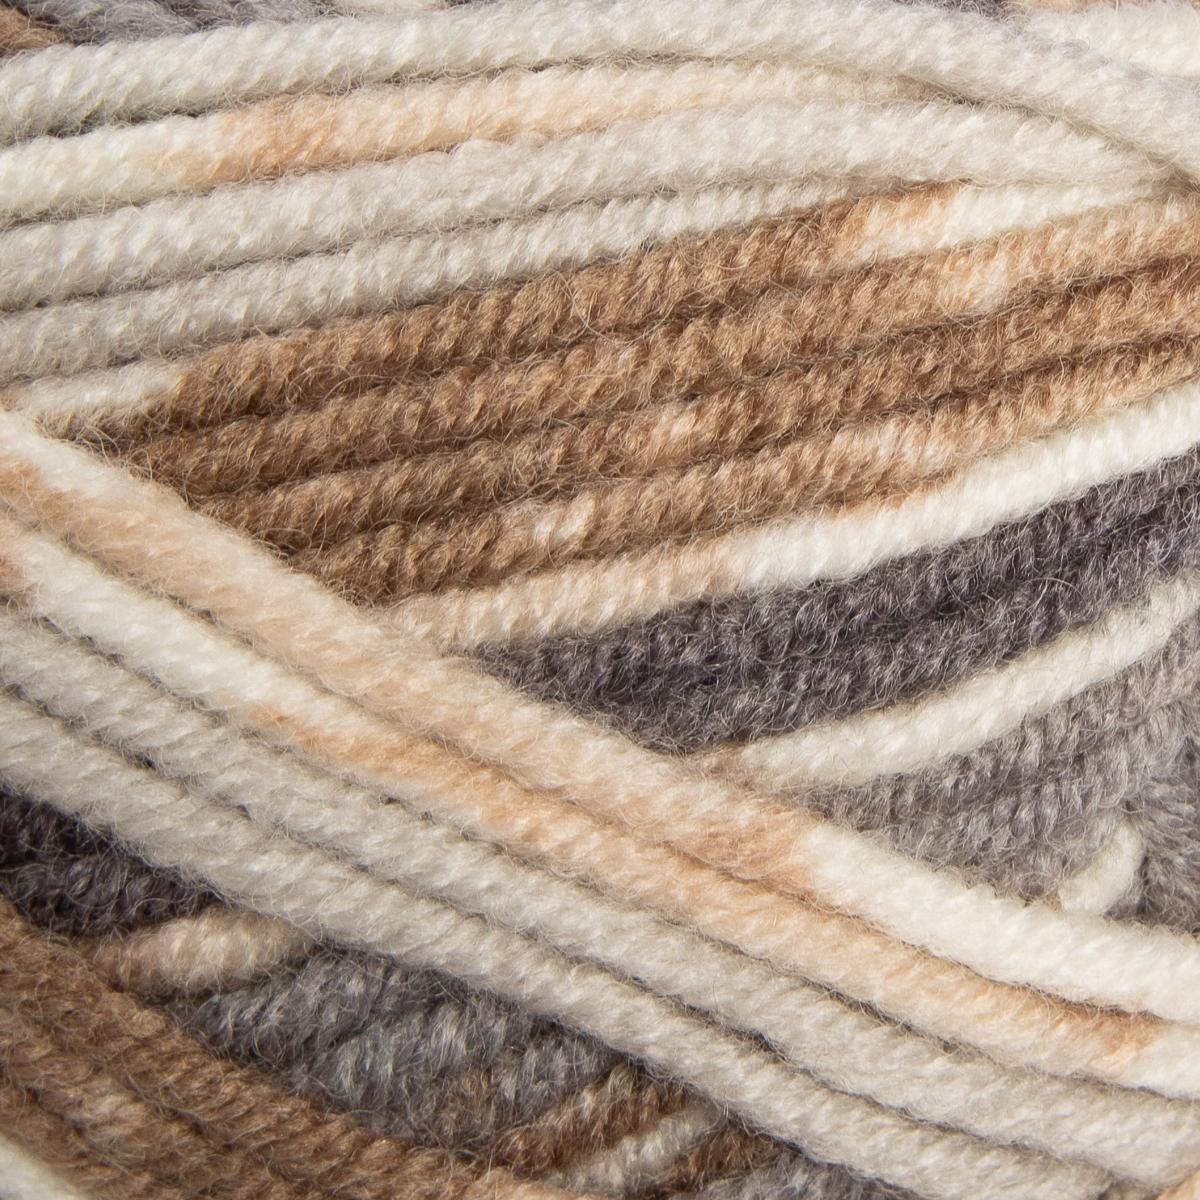 3pk-Lion-Brand-Woolspun-Acrylic-amp-Wool-Yarn-Bulky-5-Knit-Crocheting-Skeins-Soft thumbnail 83